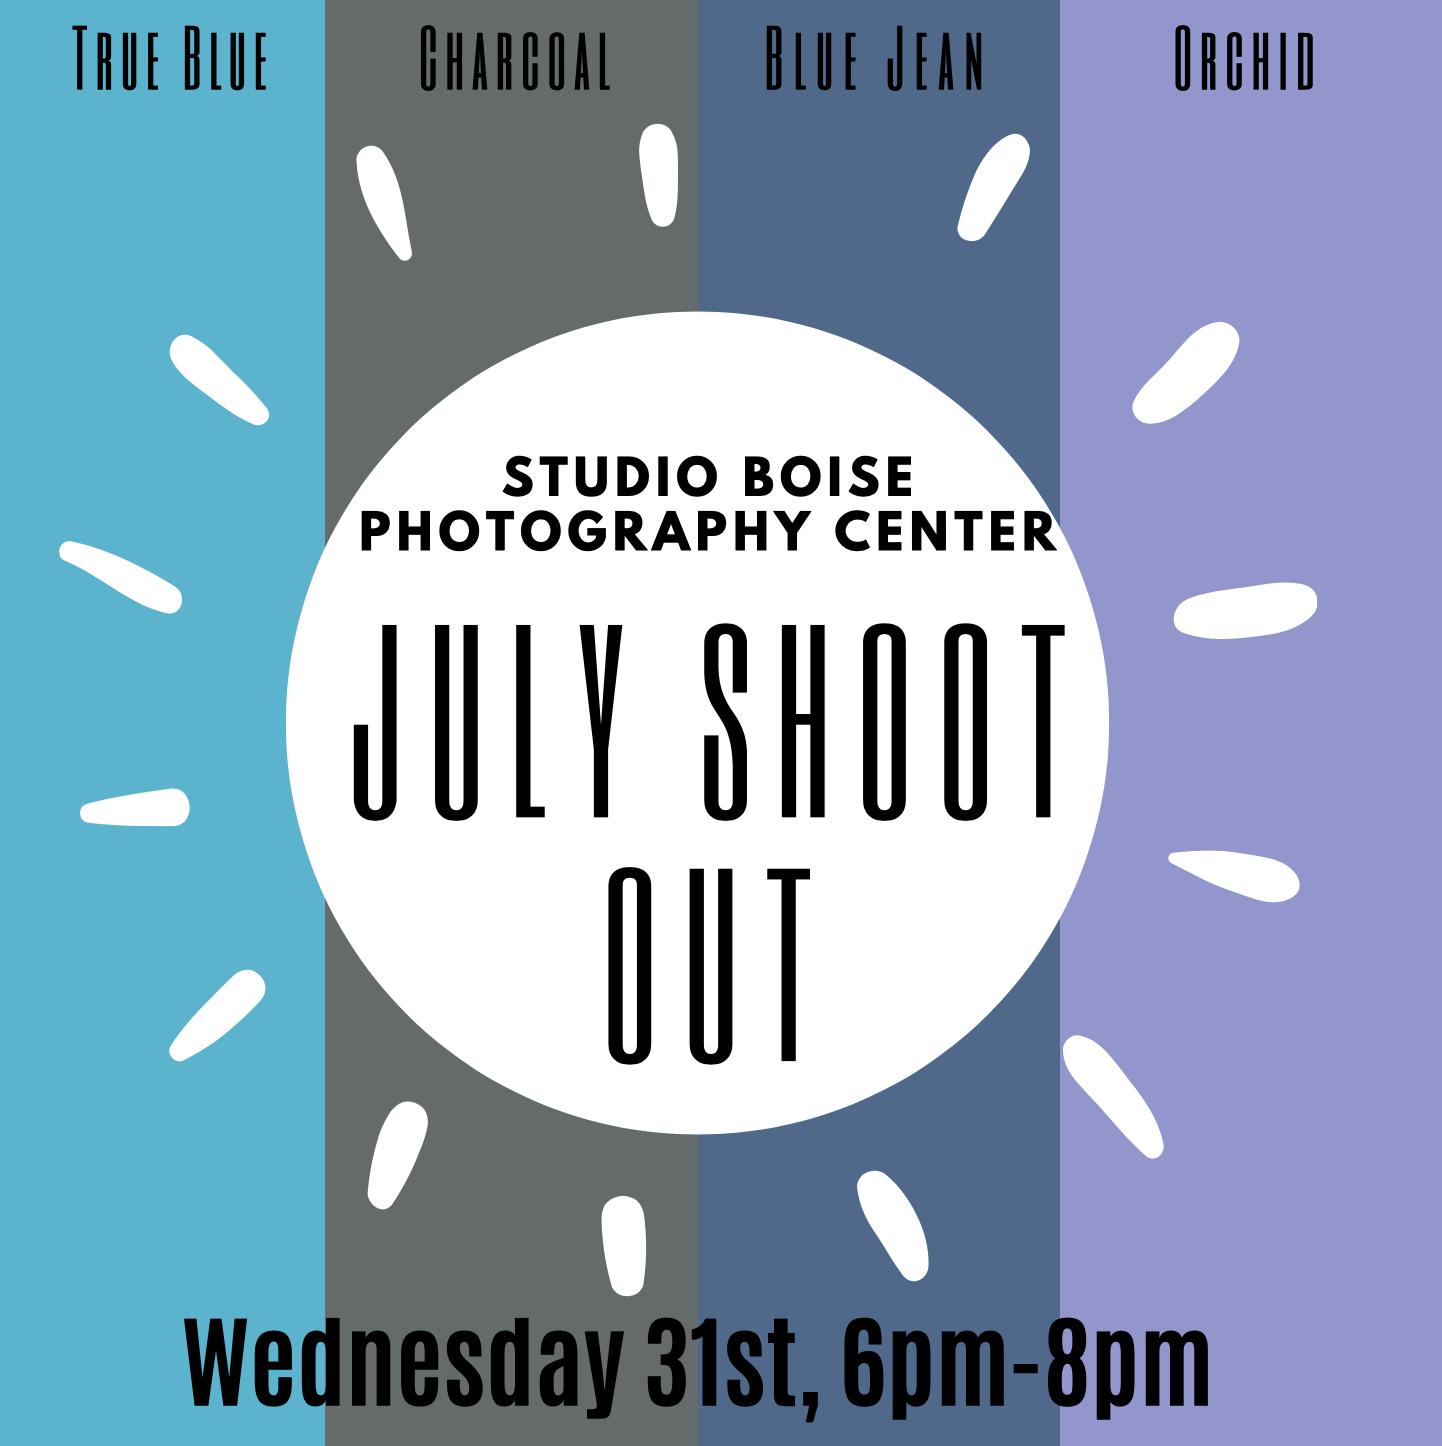 Studio Boise Photography Center Events